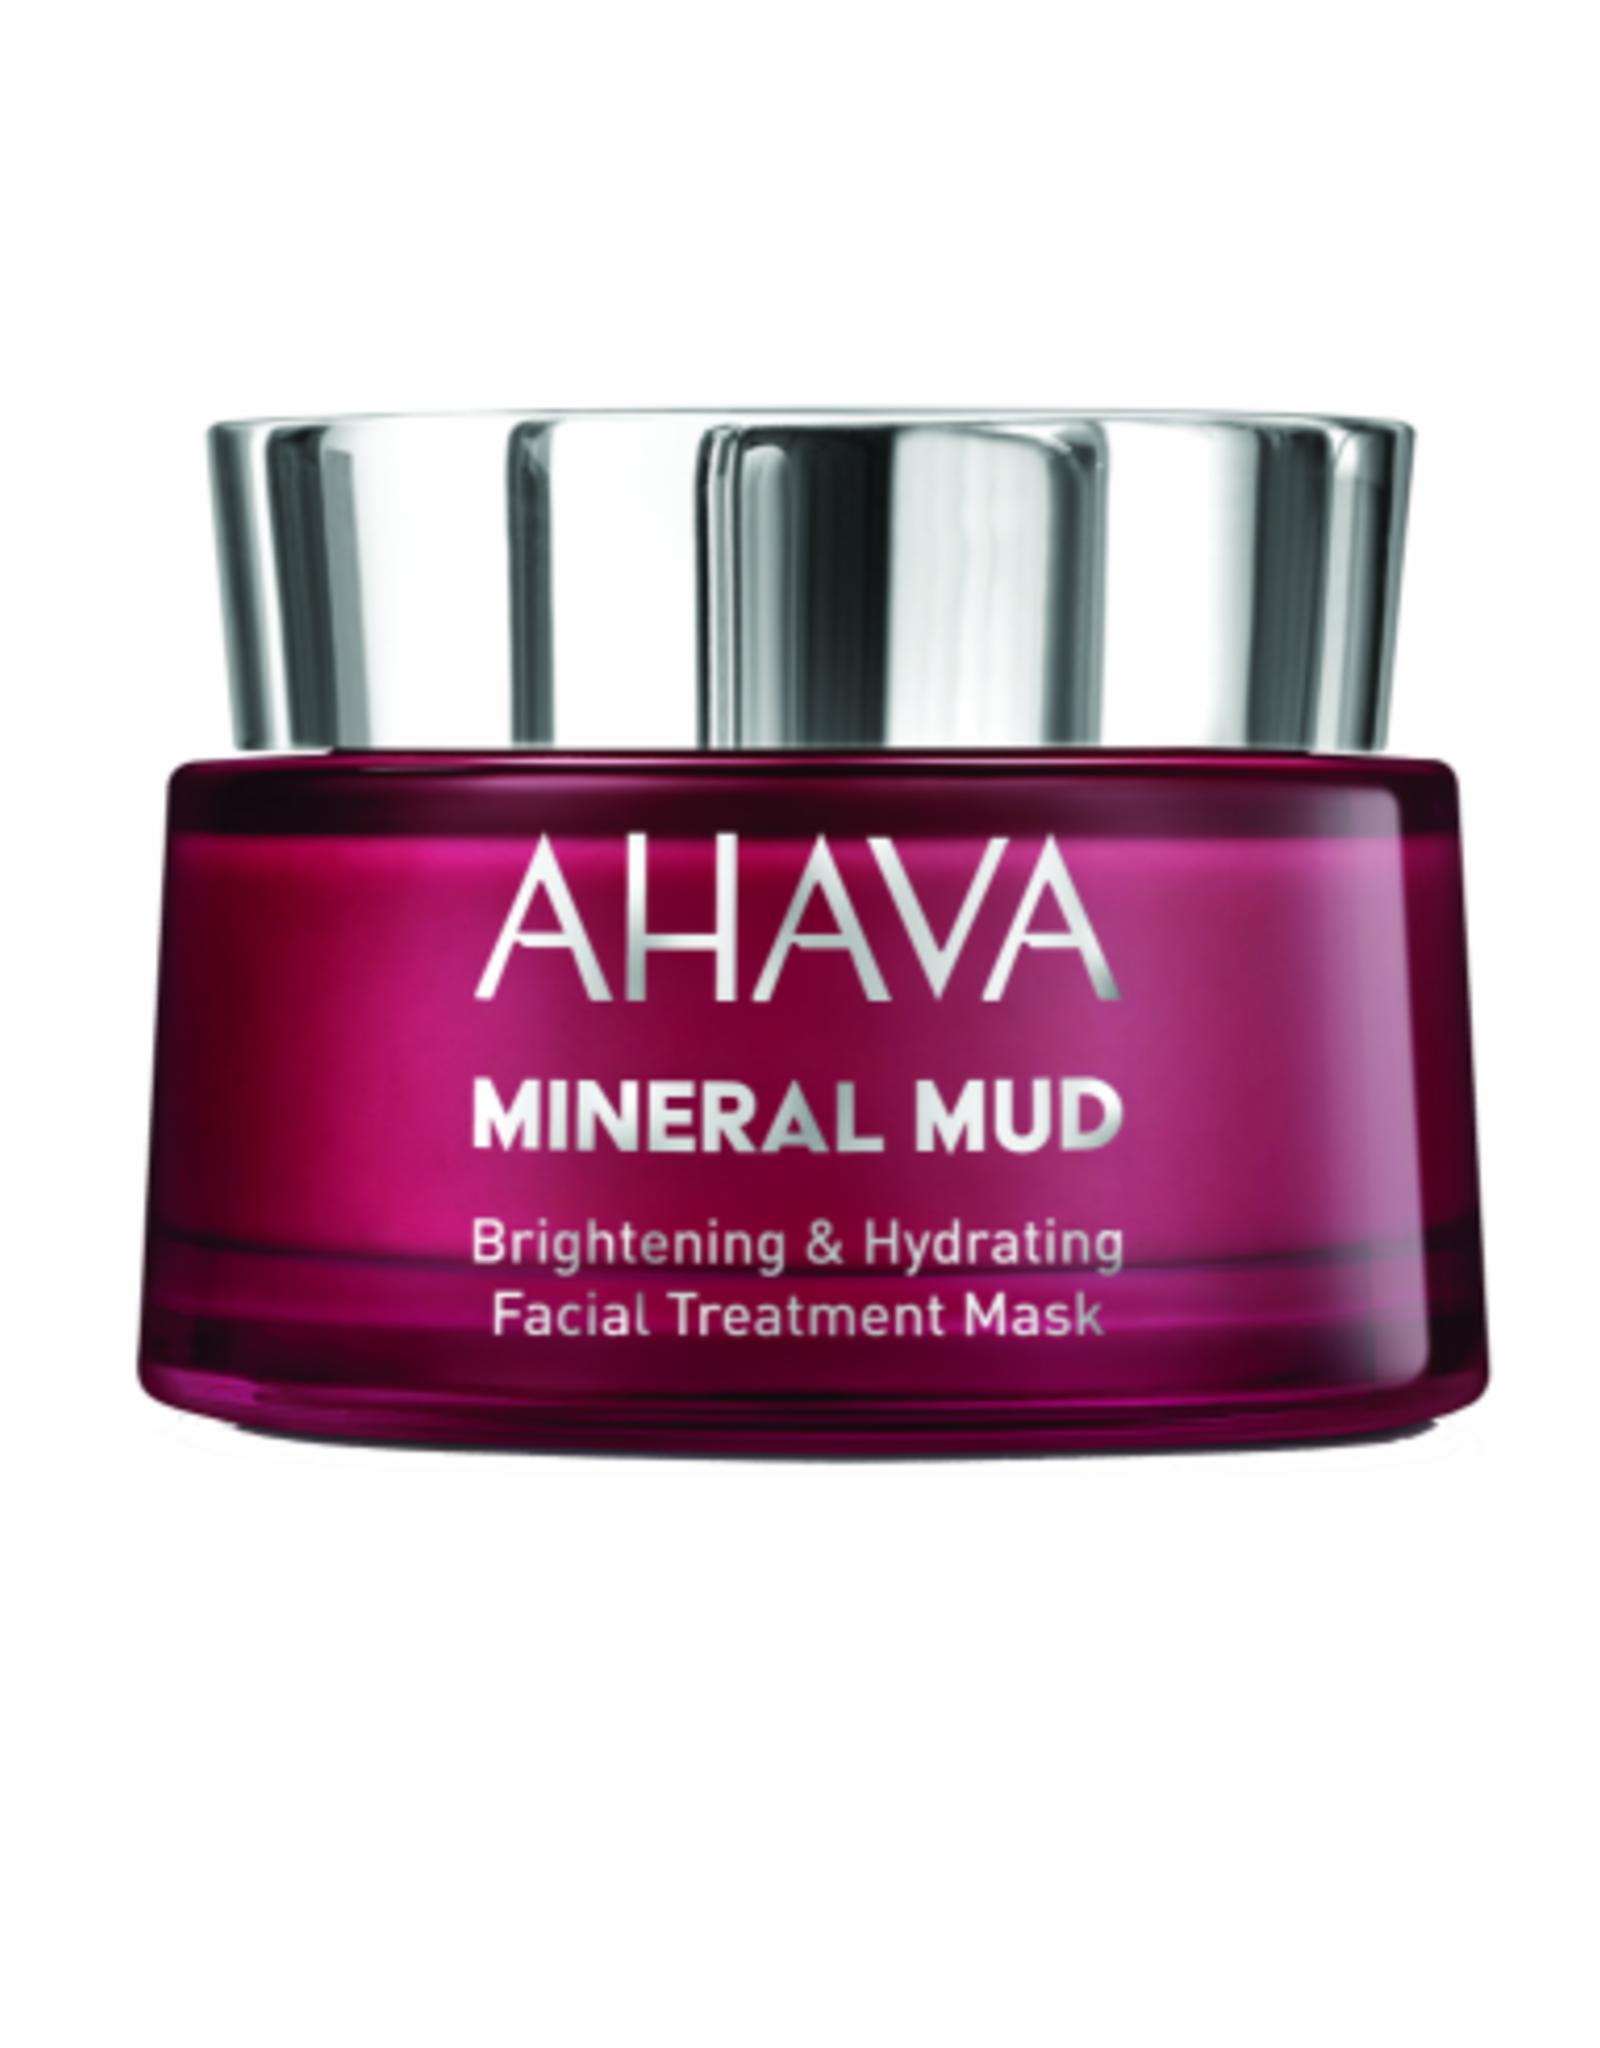 AHAVA Brightening & hydration facial treatment mask